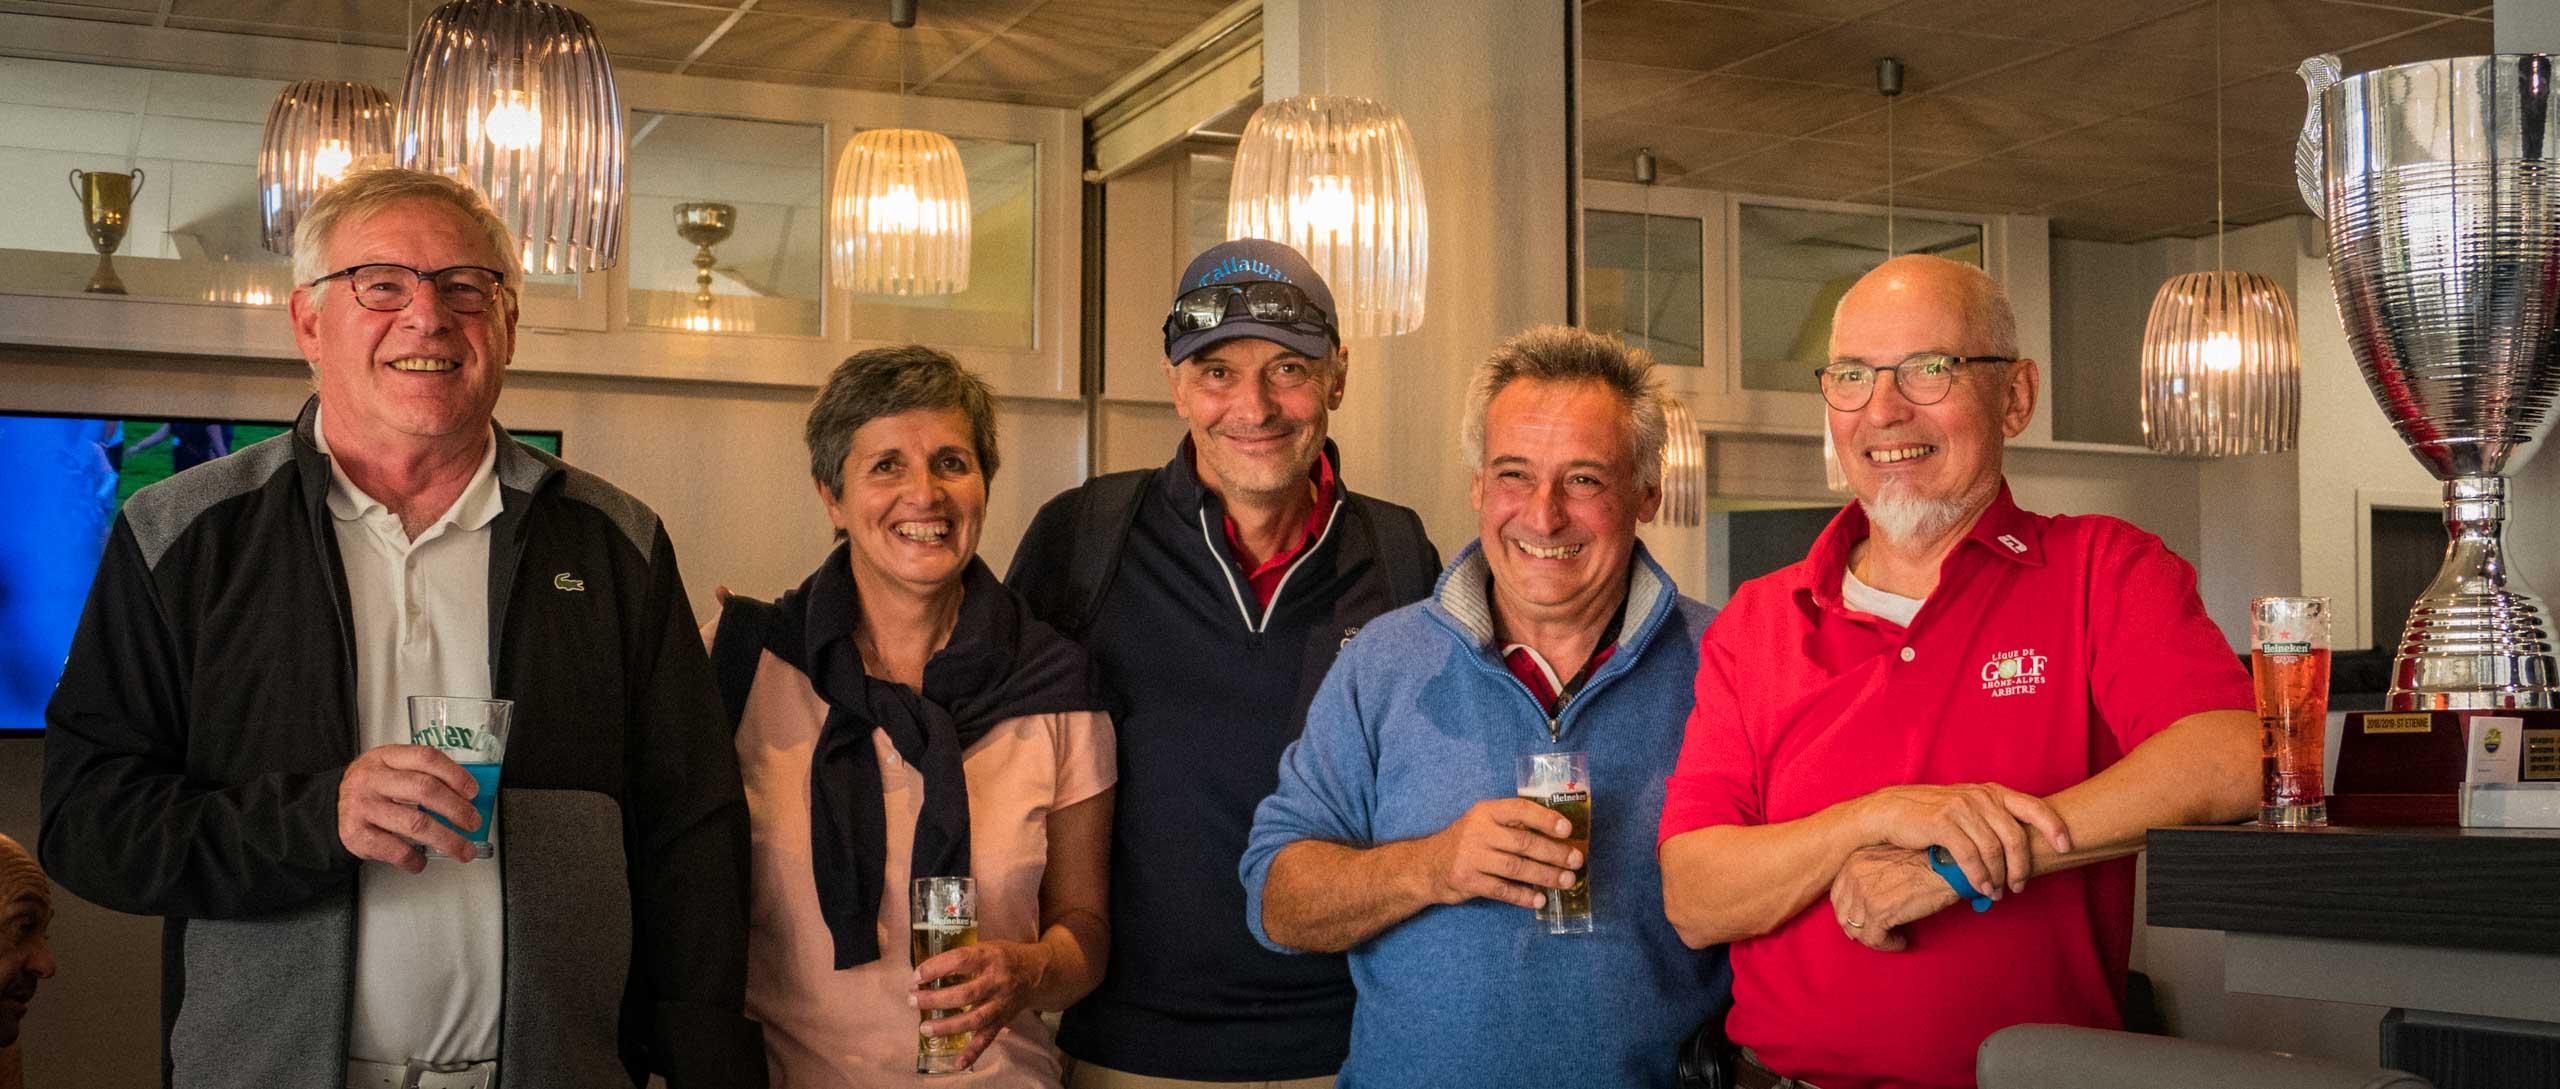 Premiere Division Regionale Aura Golf 2019 Saint Etienne 22